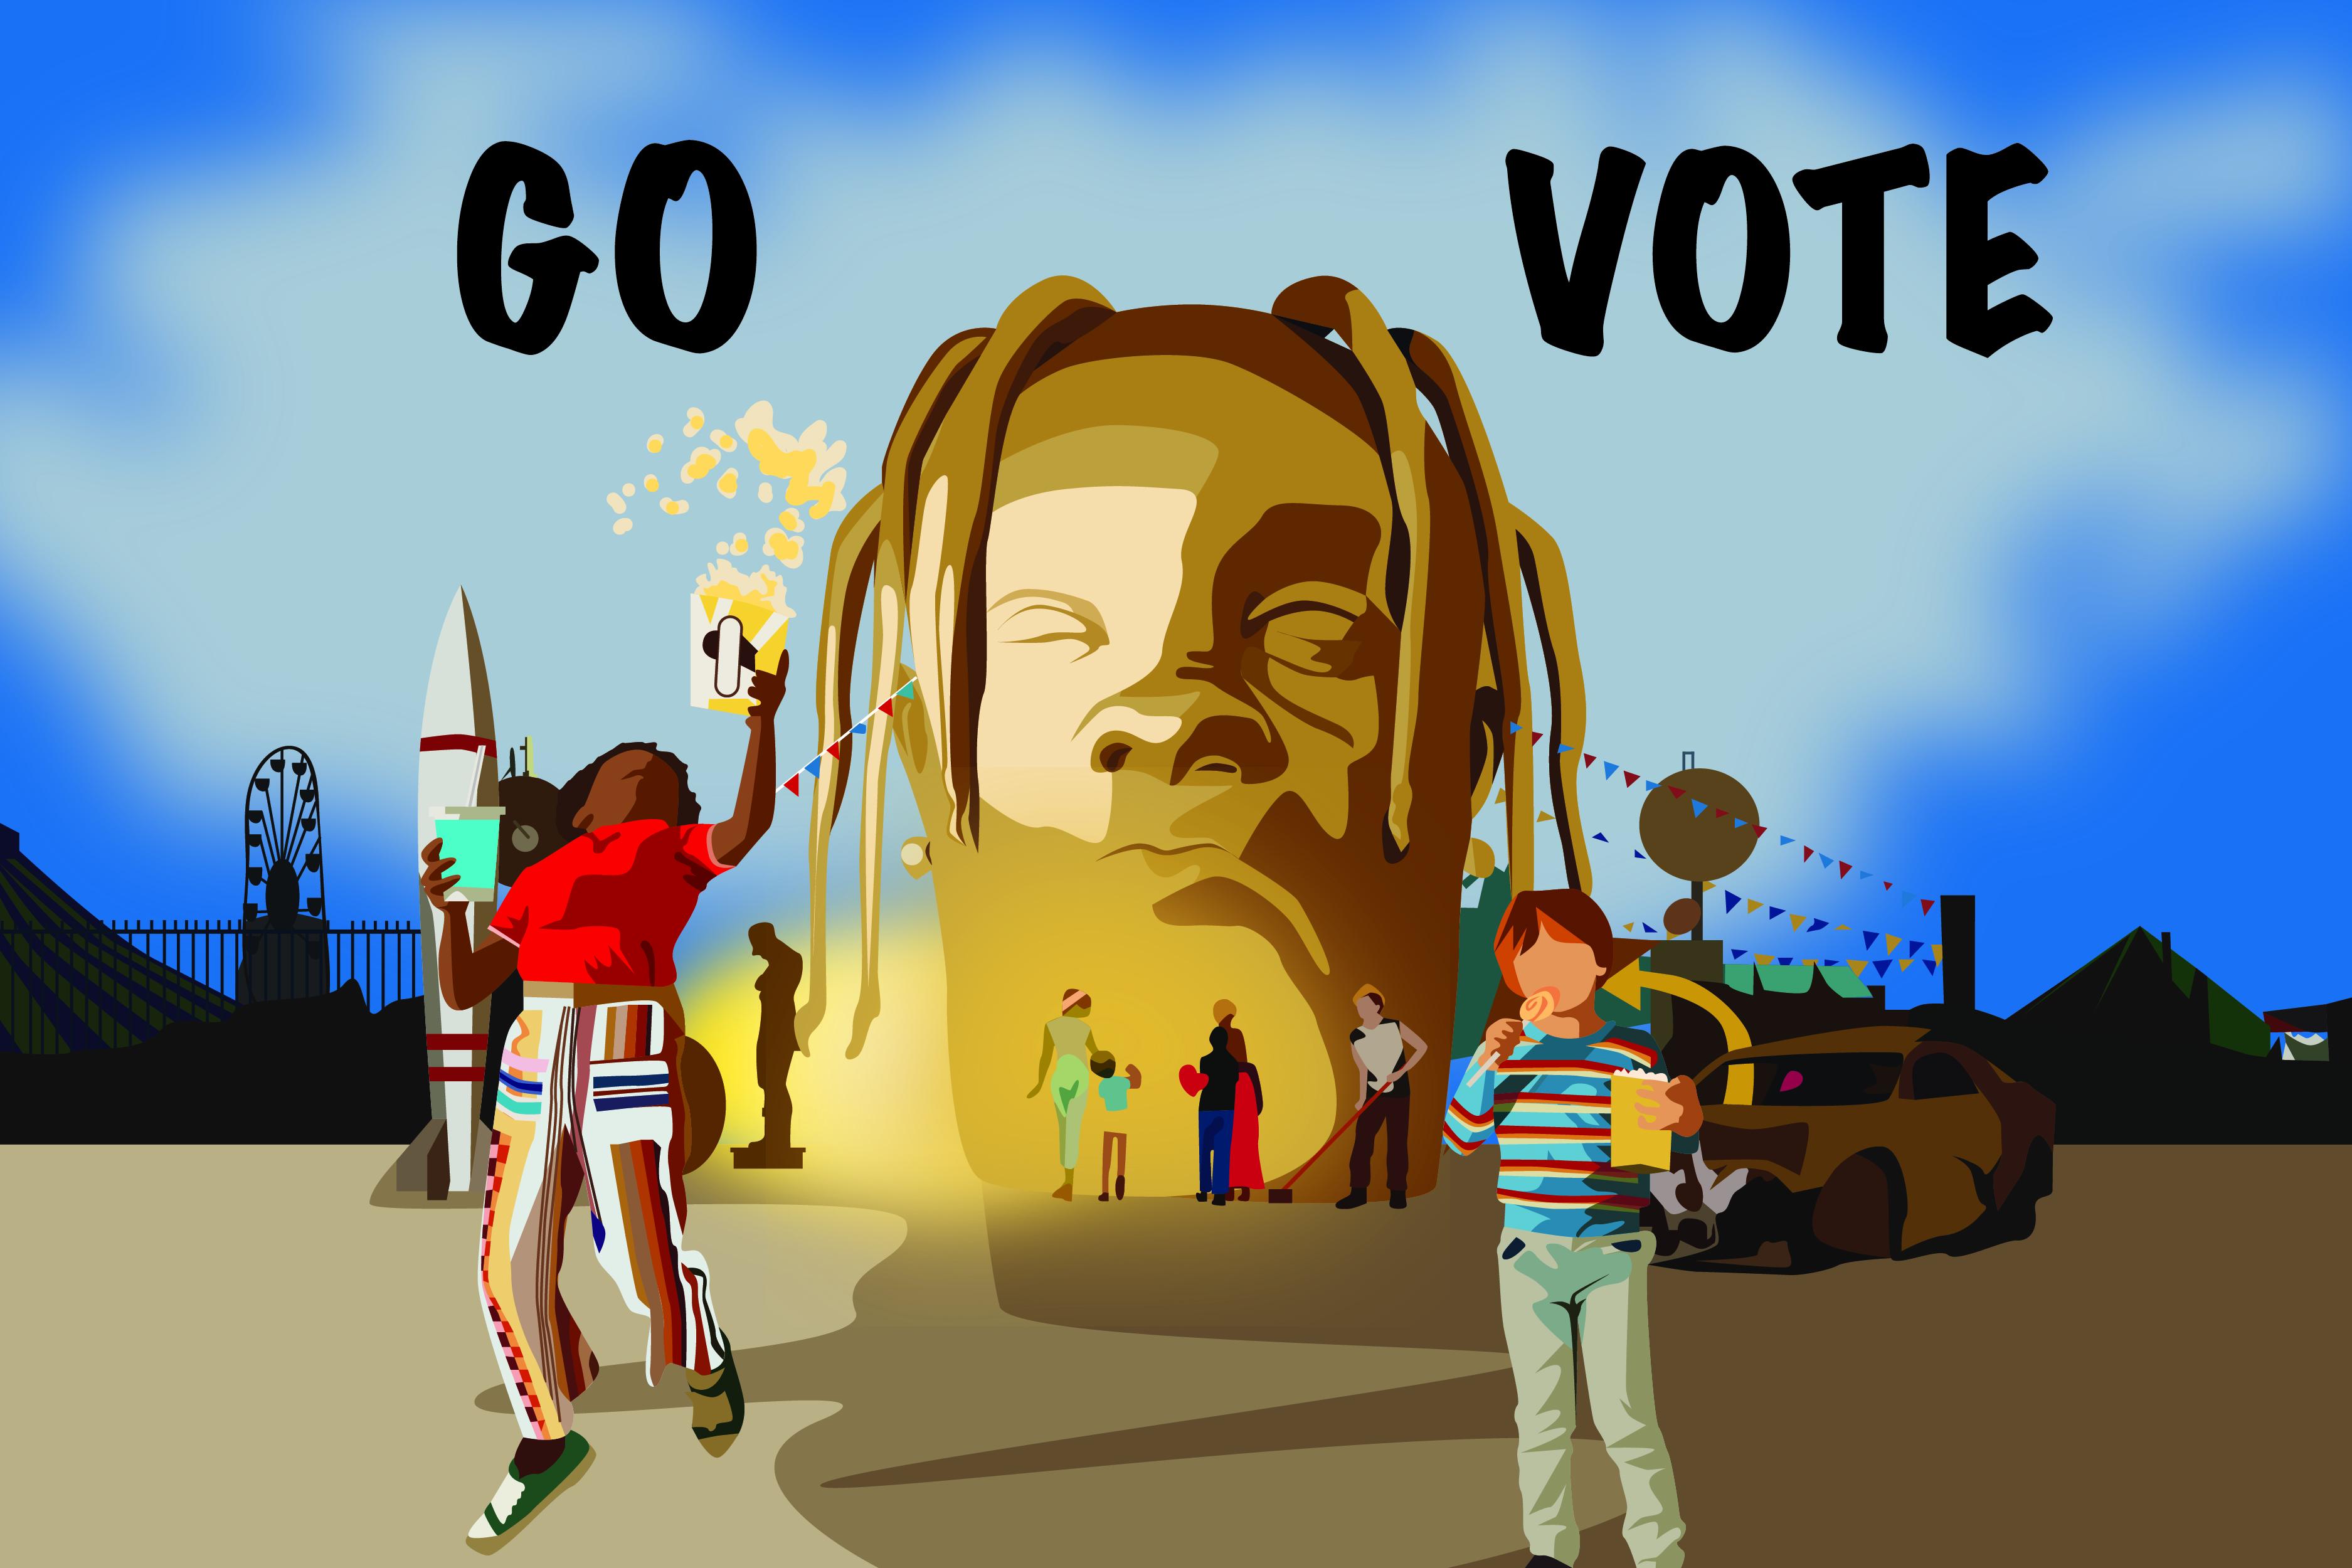 Music to invoke the voter